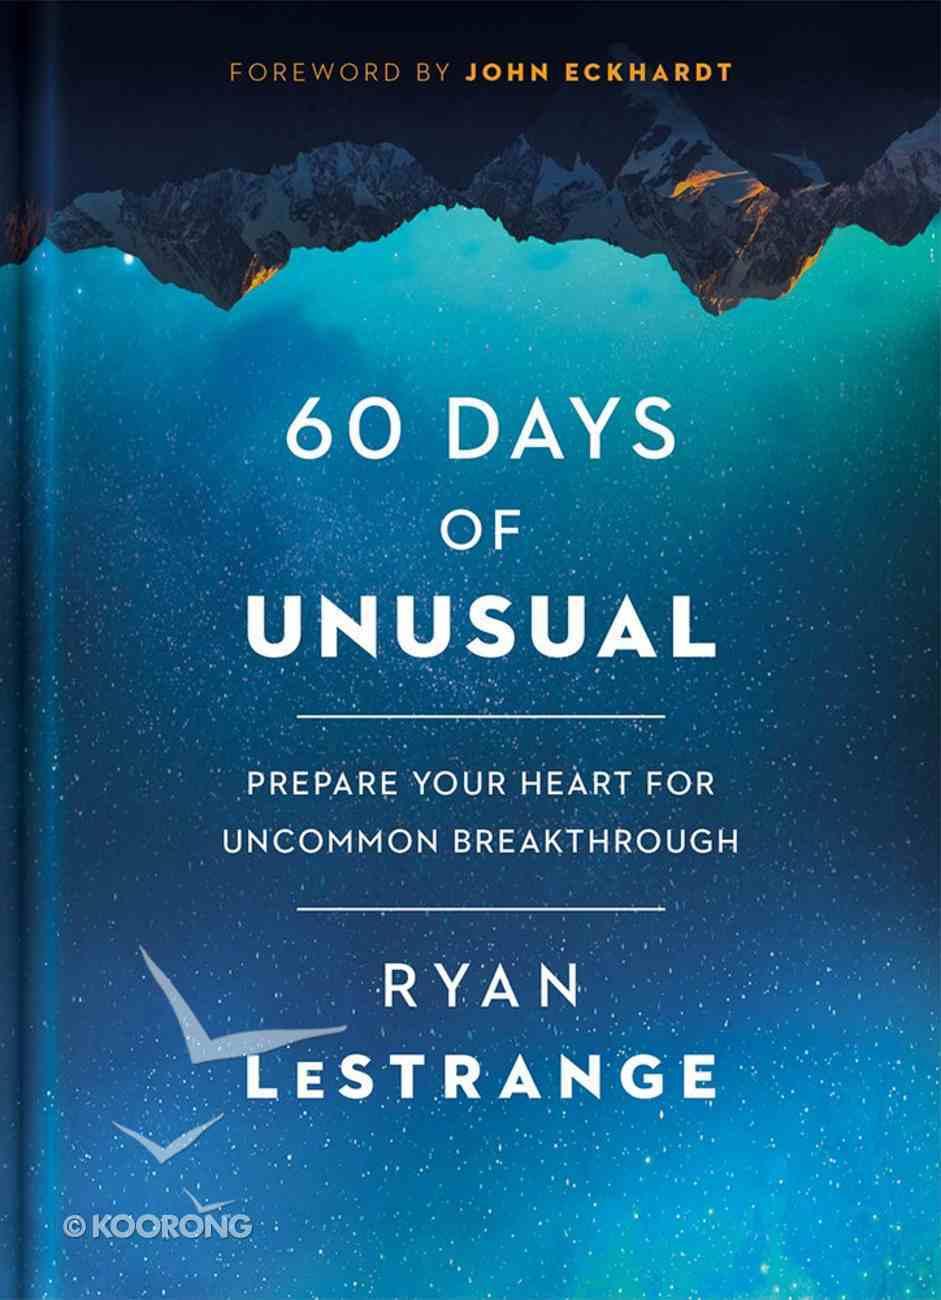 60 Days of Unusual: Prepare Your Heart For Uncommon Breakthrough Hardback